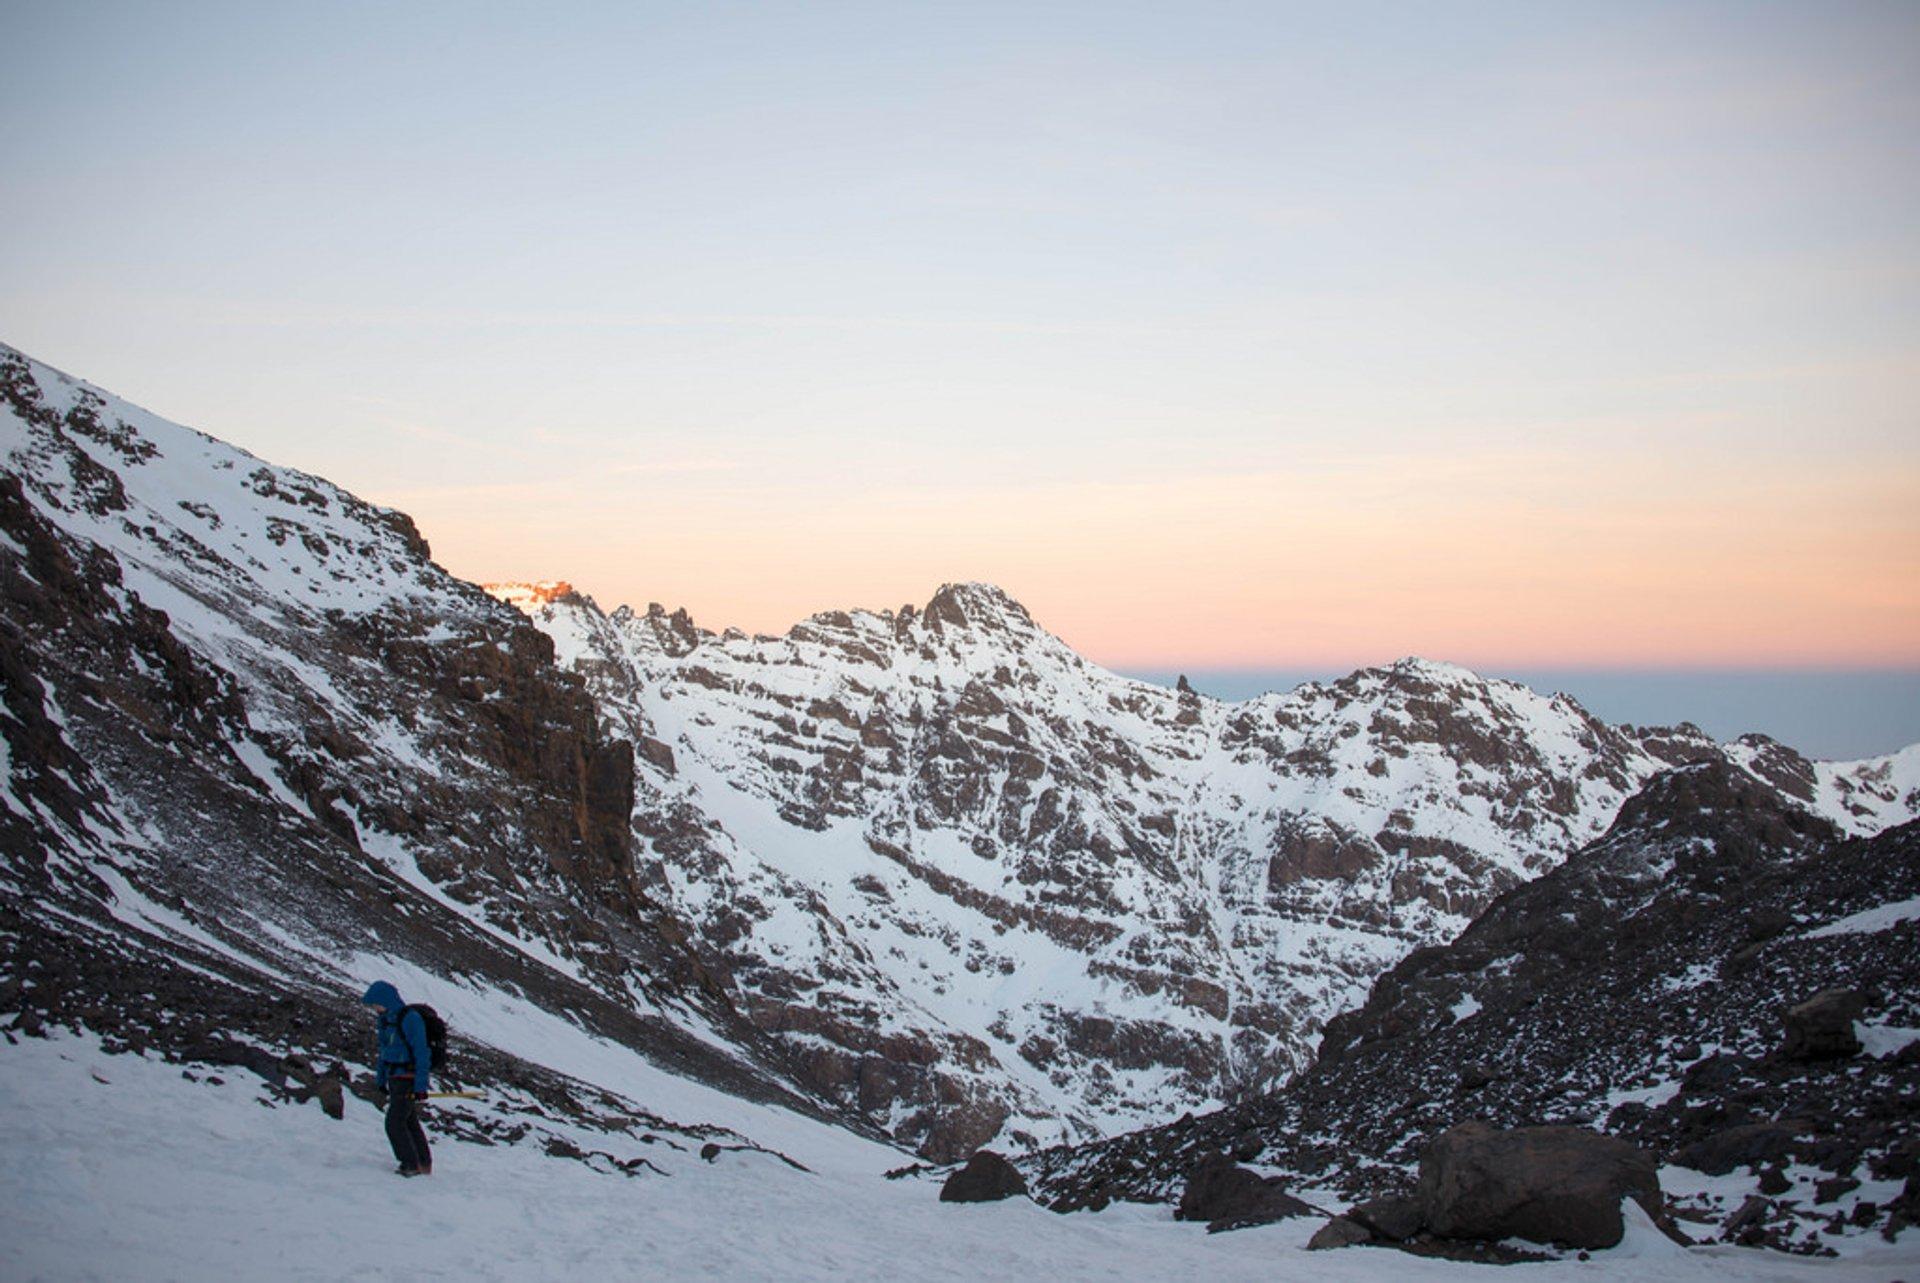 Climbing Mount Toubkal in Morocco - Best Season